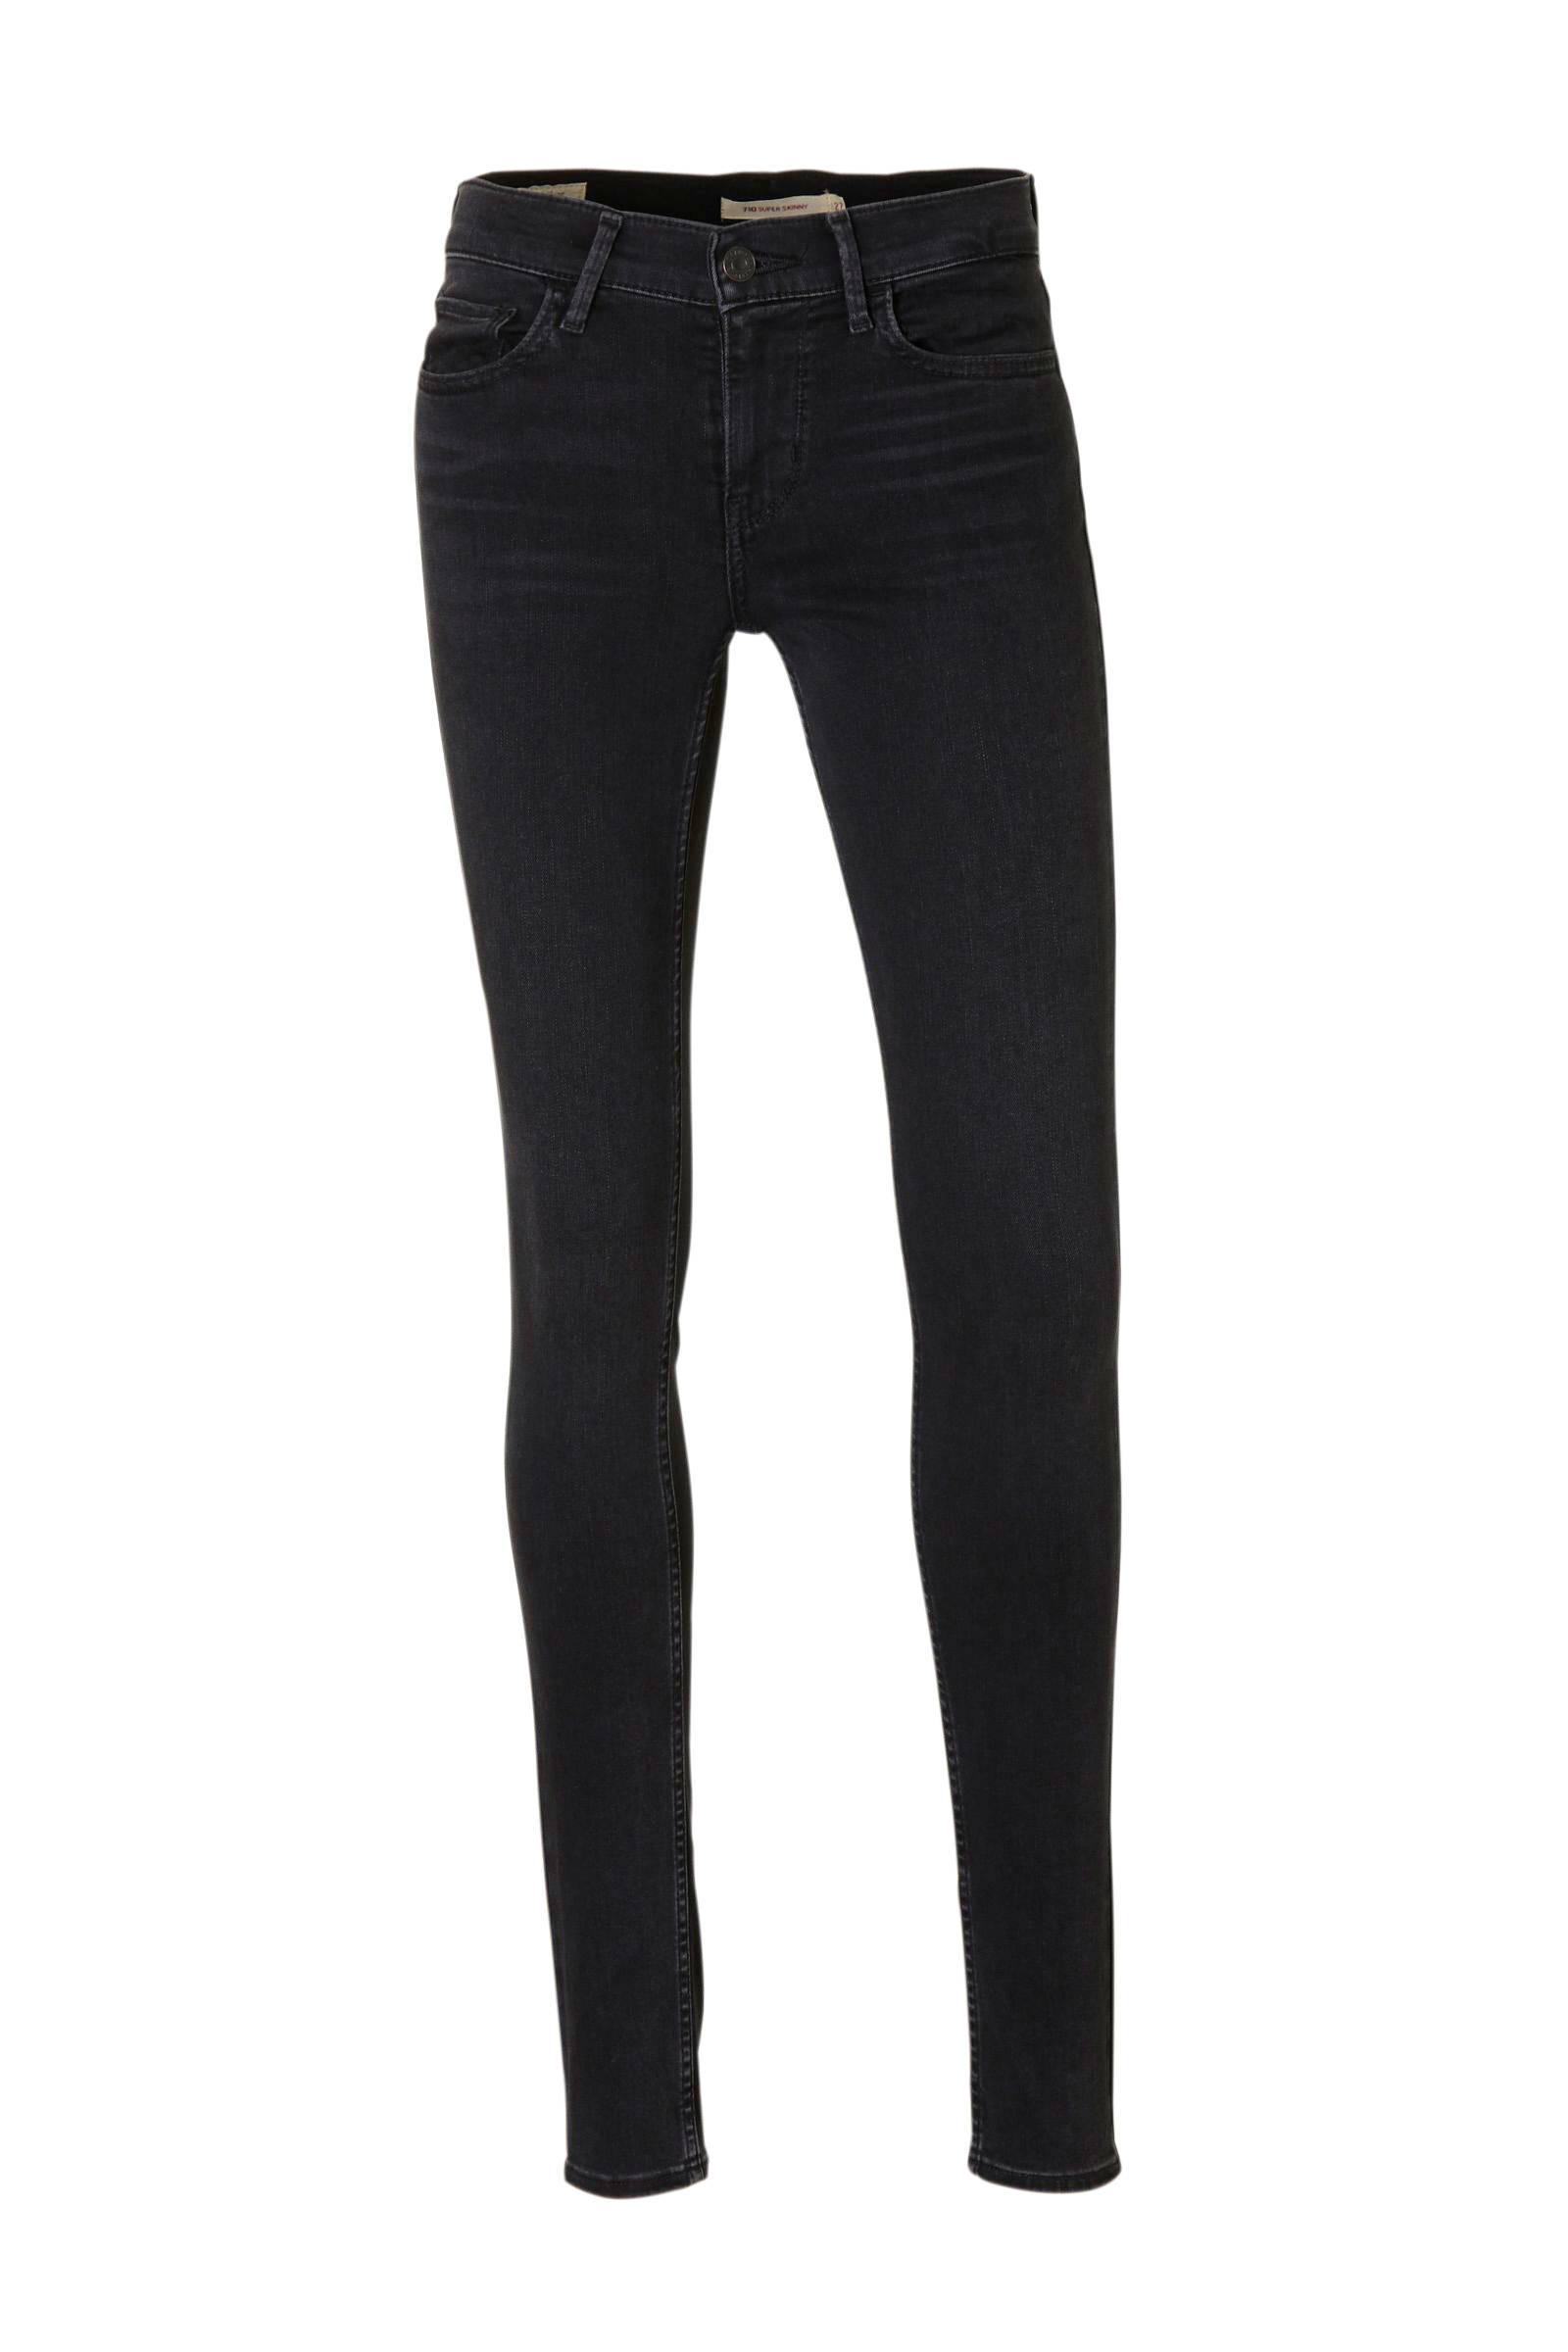 Levi's 710 super skinny jeans  (dames)